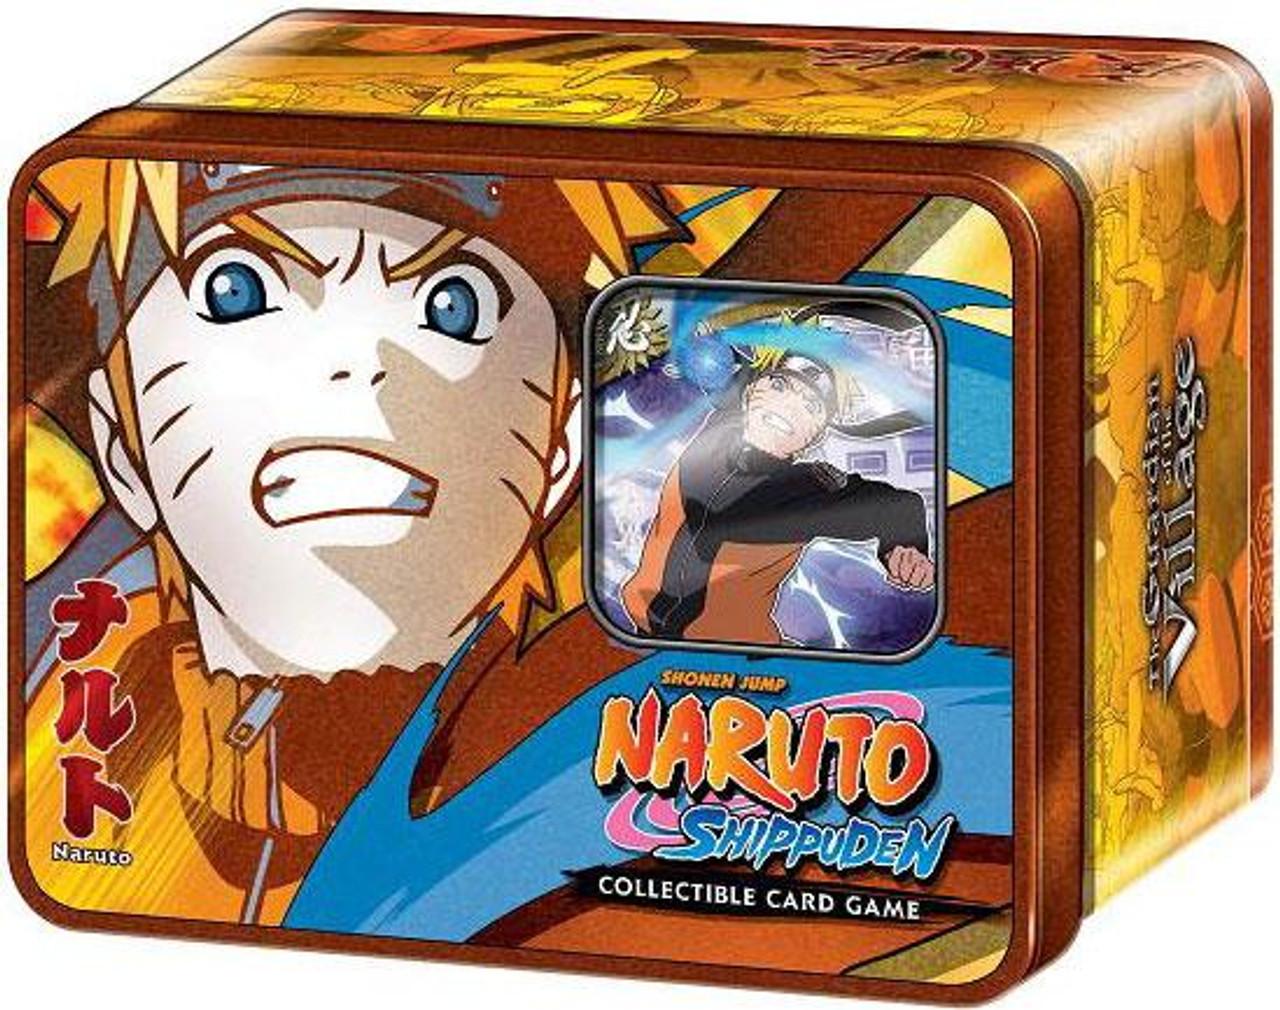 Shippuden Card Game Guardian of the Village Naruto Collector Tin